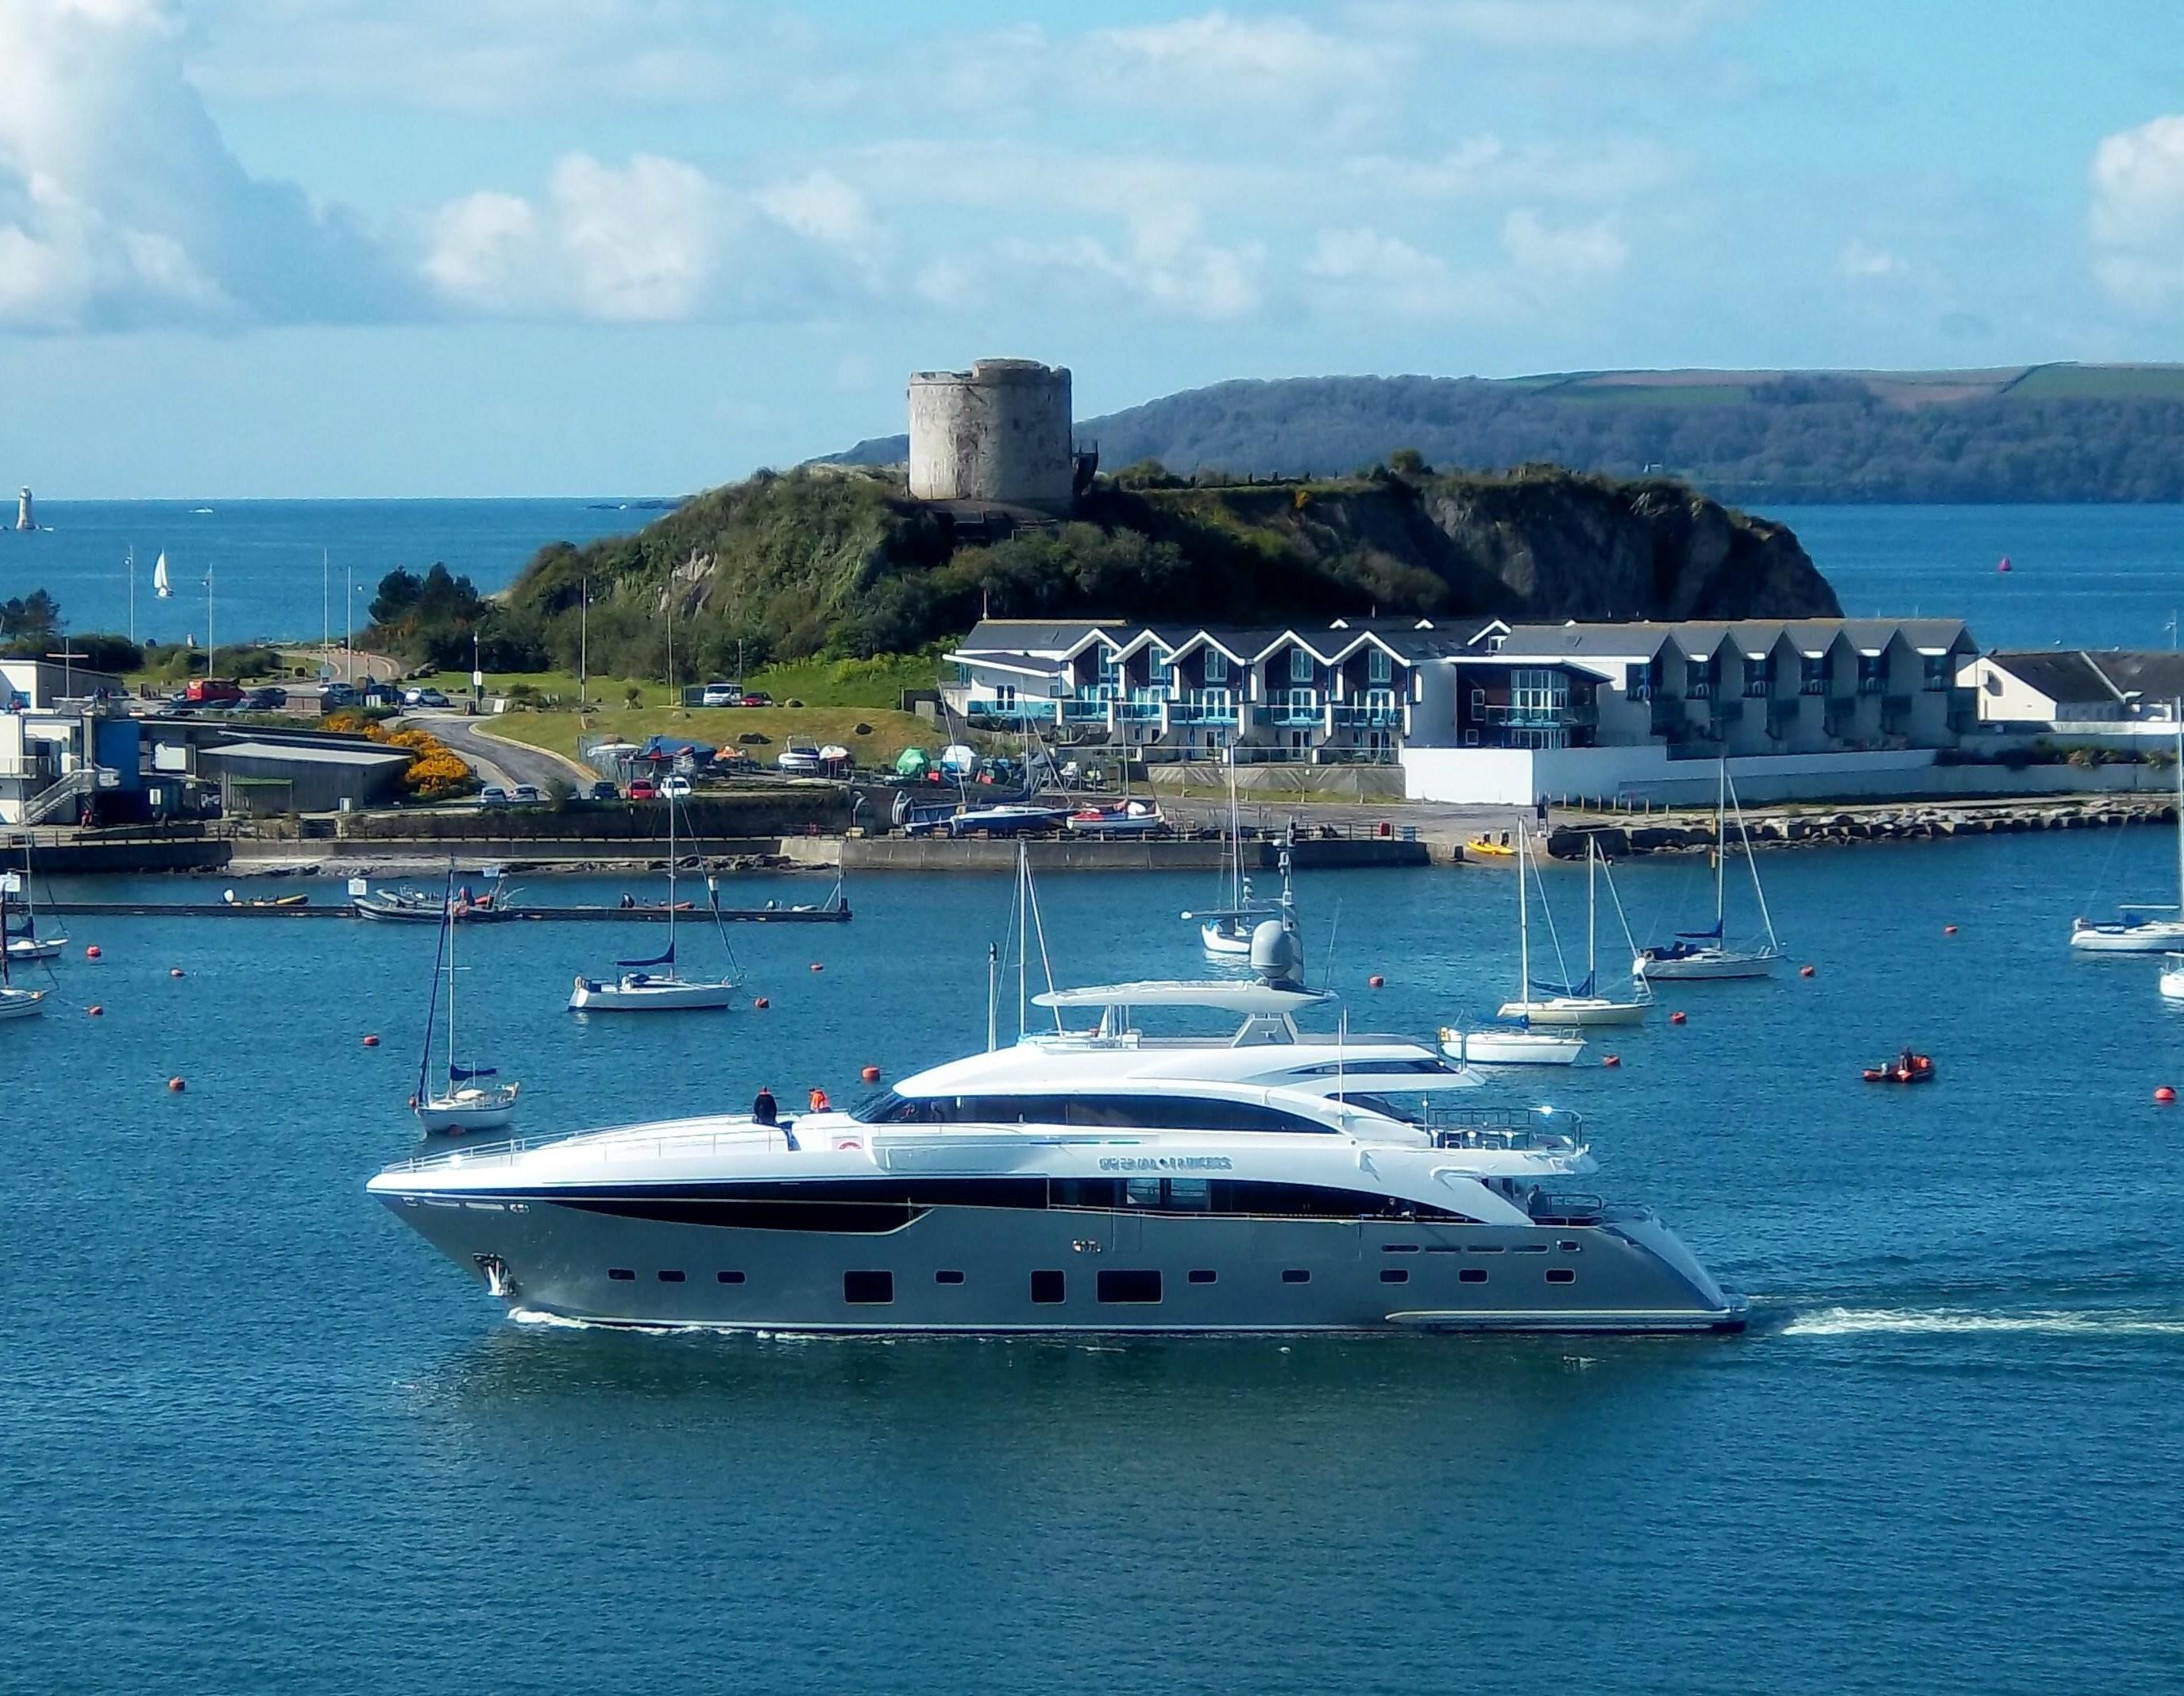 Sunseeker Yacht IMPERIAL PRINCESS